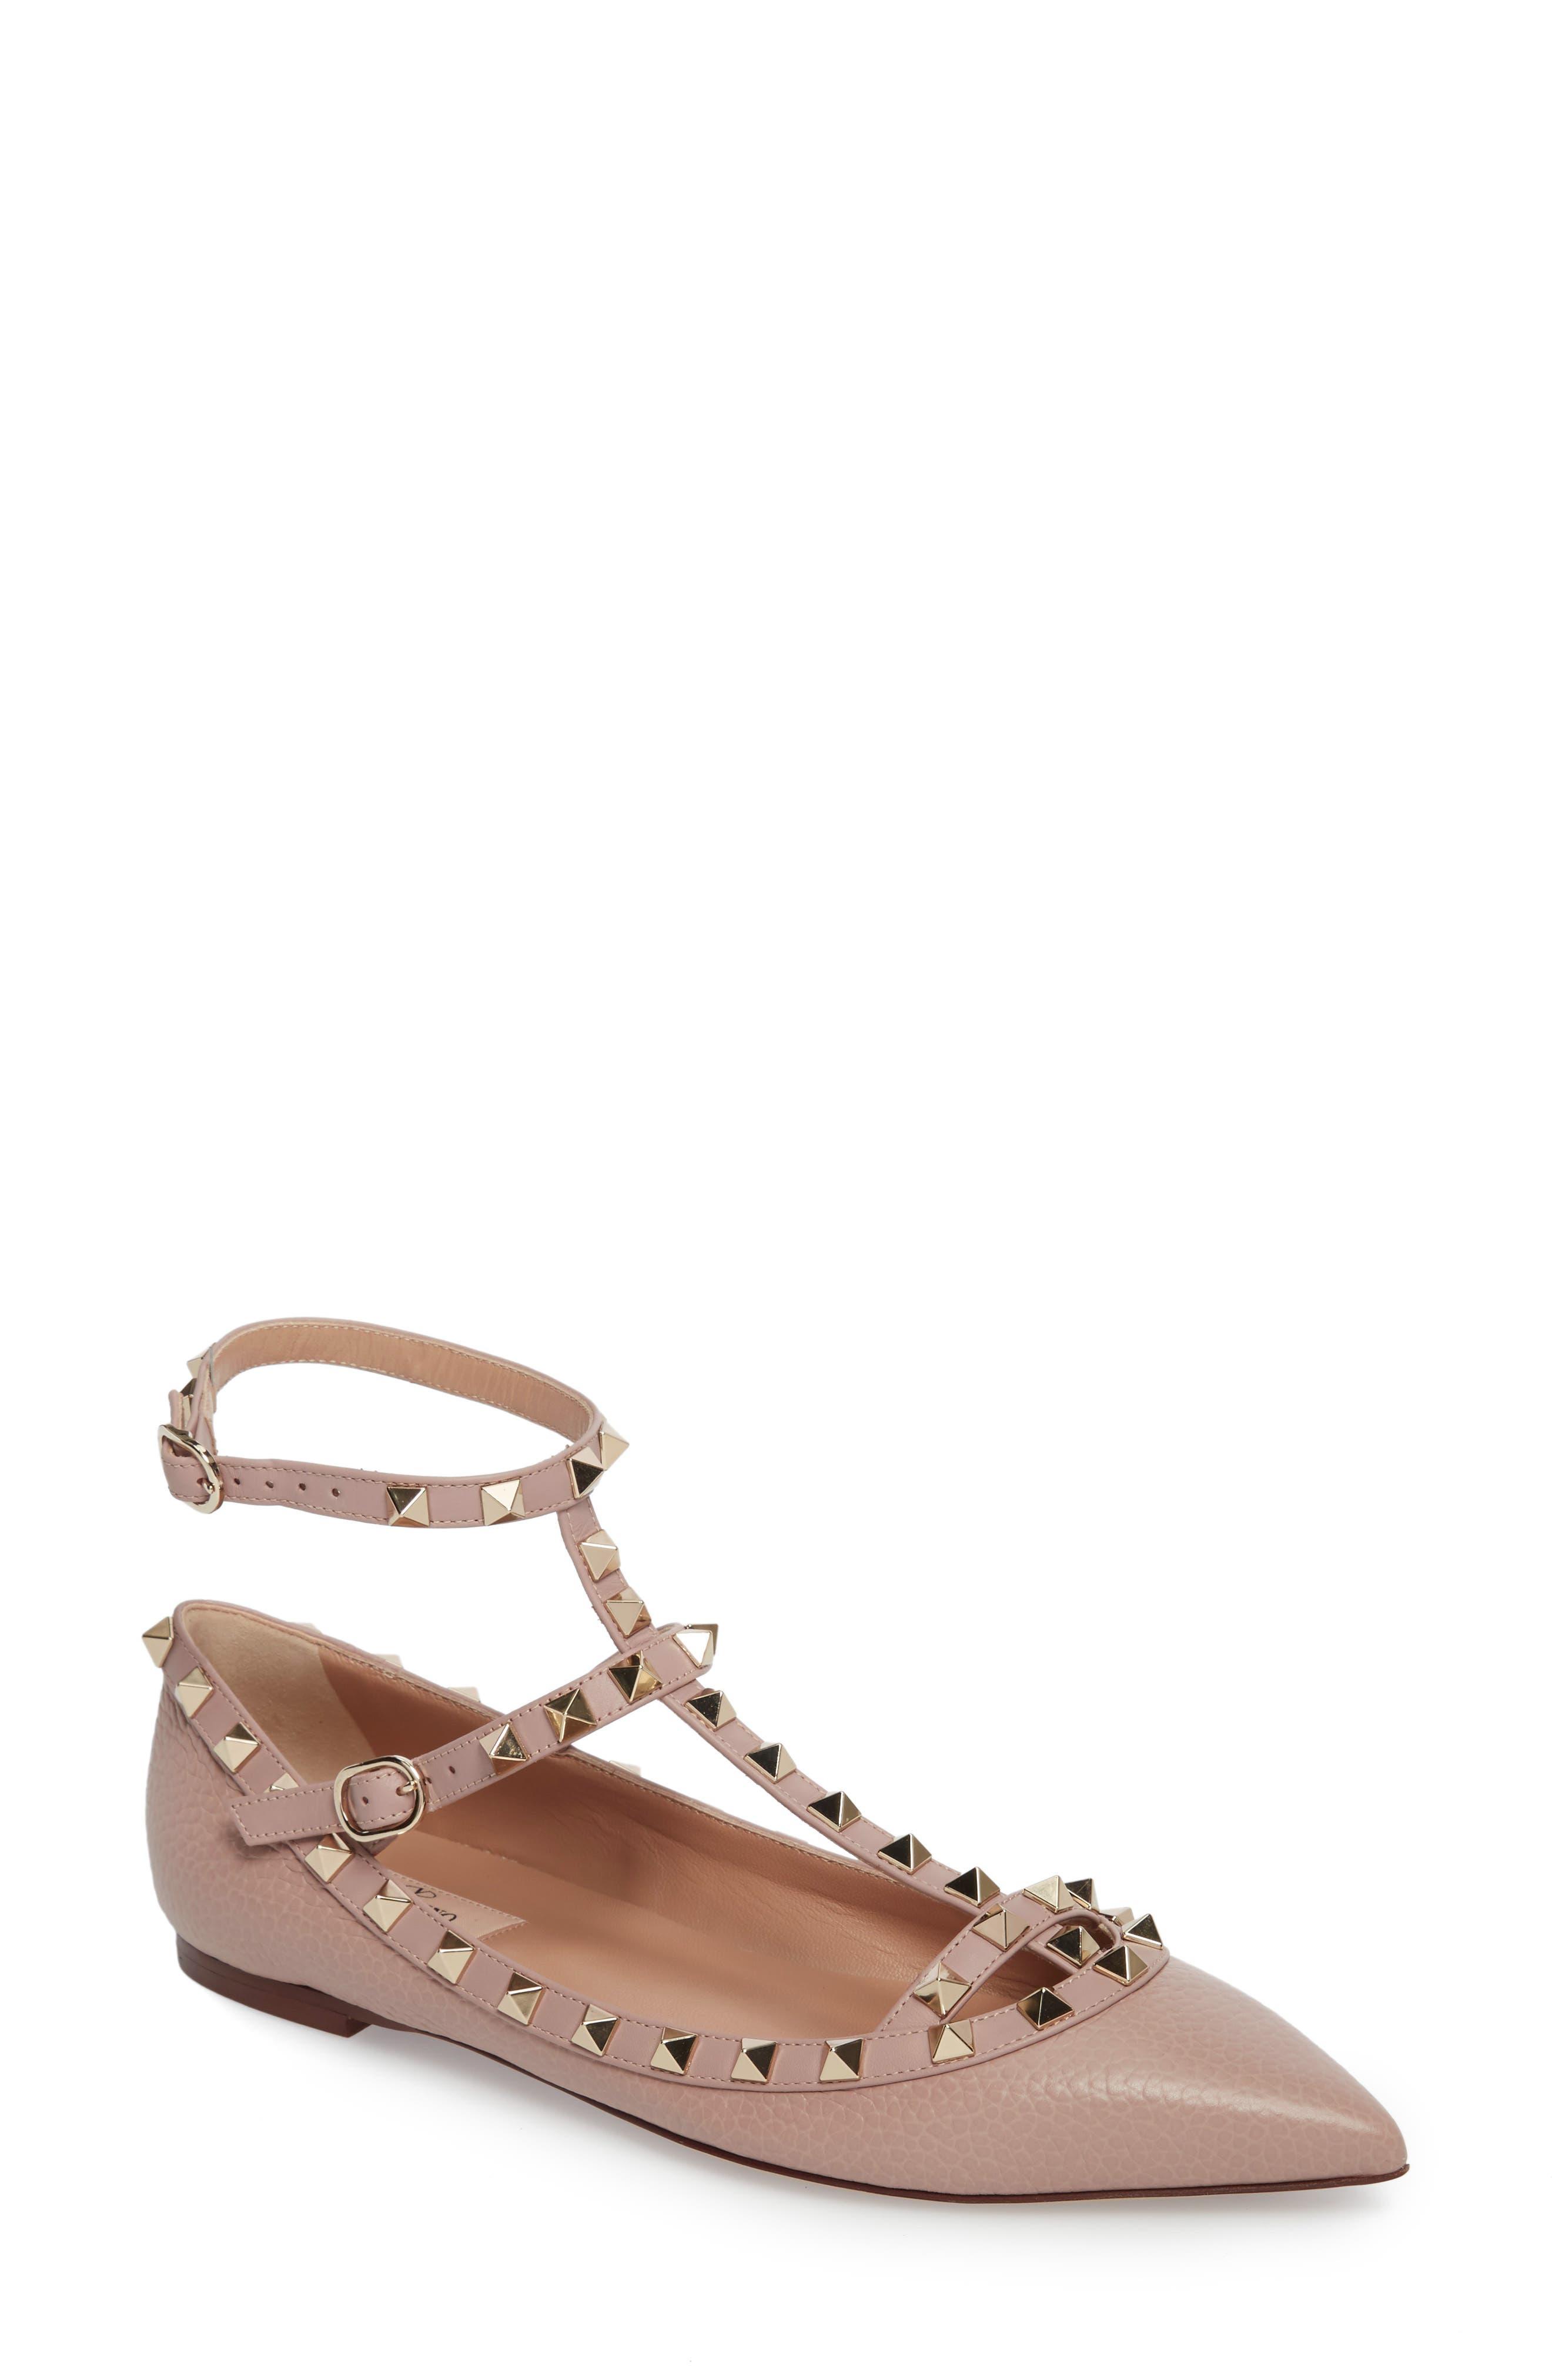 Rockstud Ankle Strap Pointy Toe Flat, Main, color, BEIGE